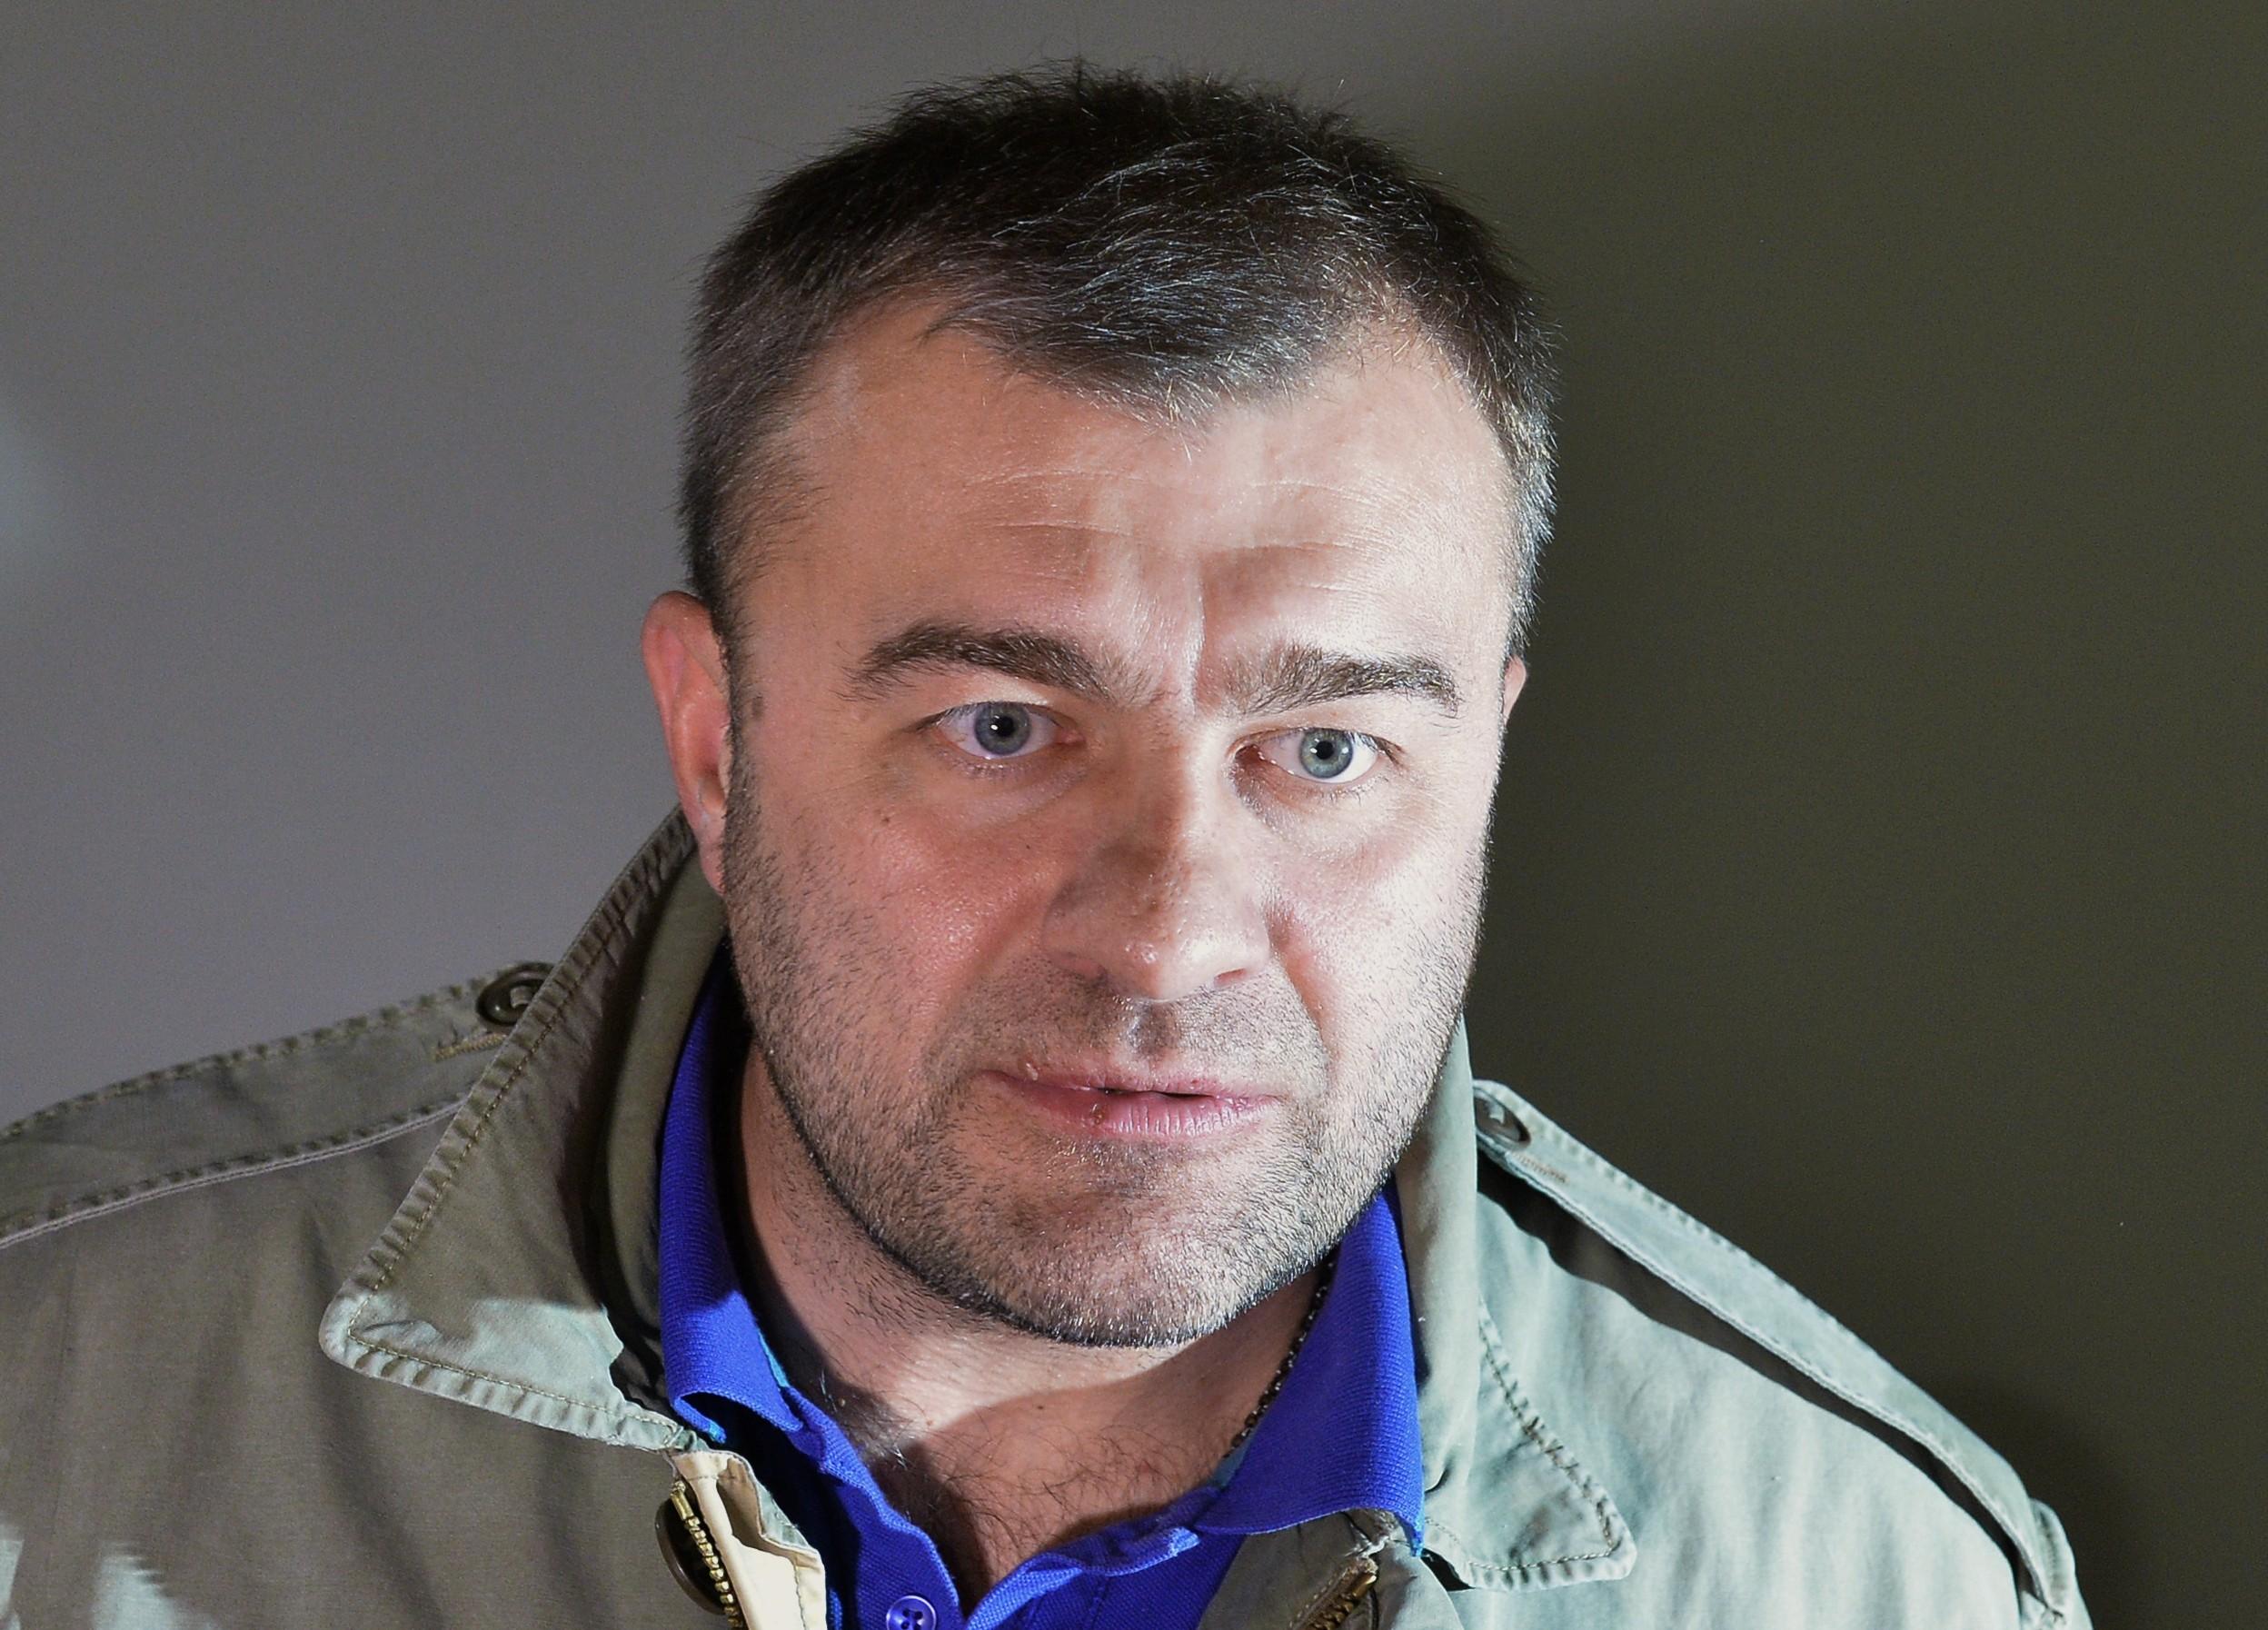 <p><span>Михаил Пореченков.&nbsp;Фото: &copy; РИА Новости/Алексей Куденко</span></p>